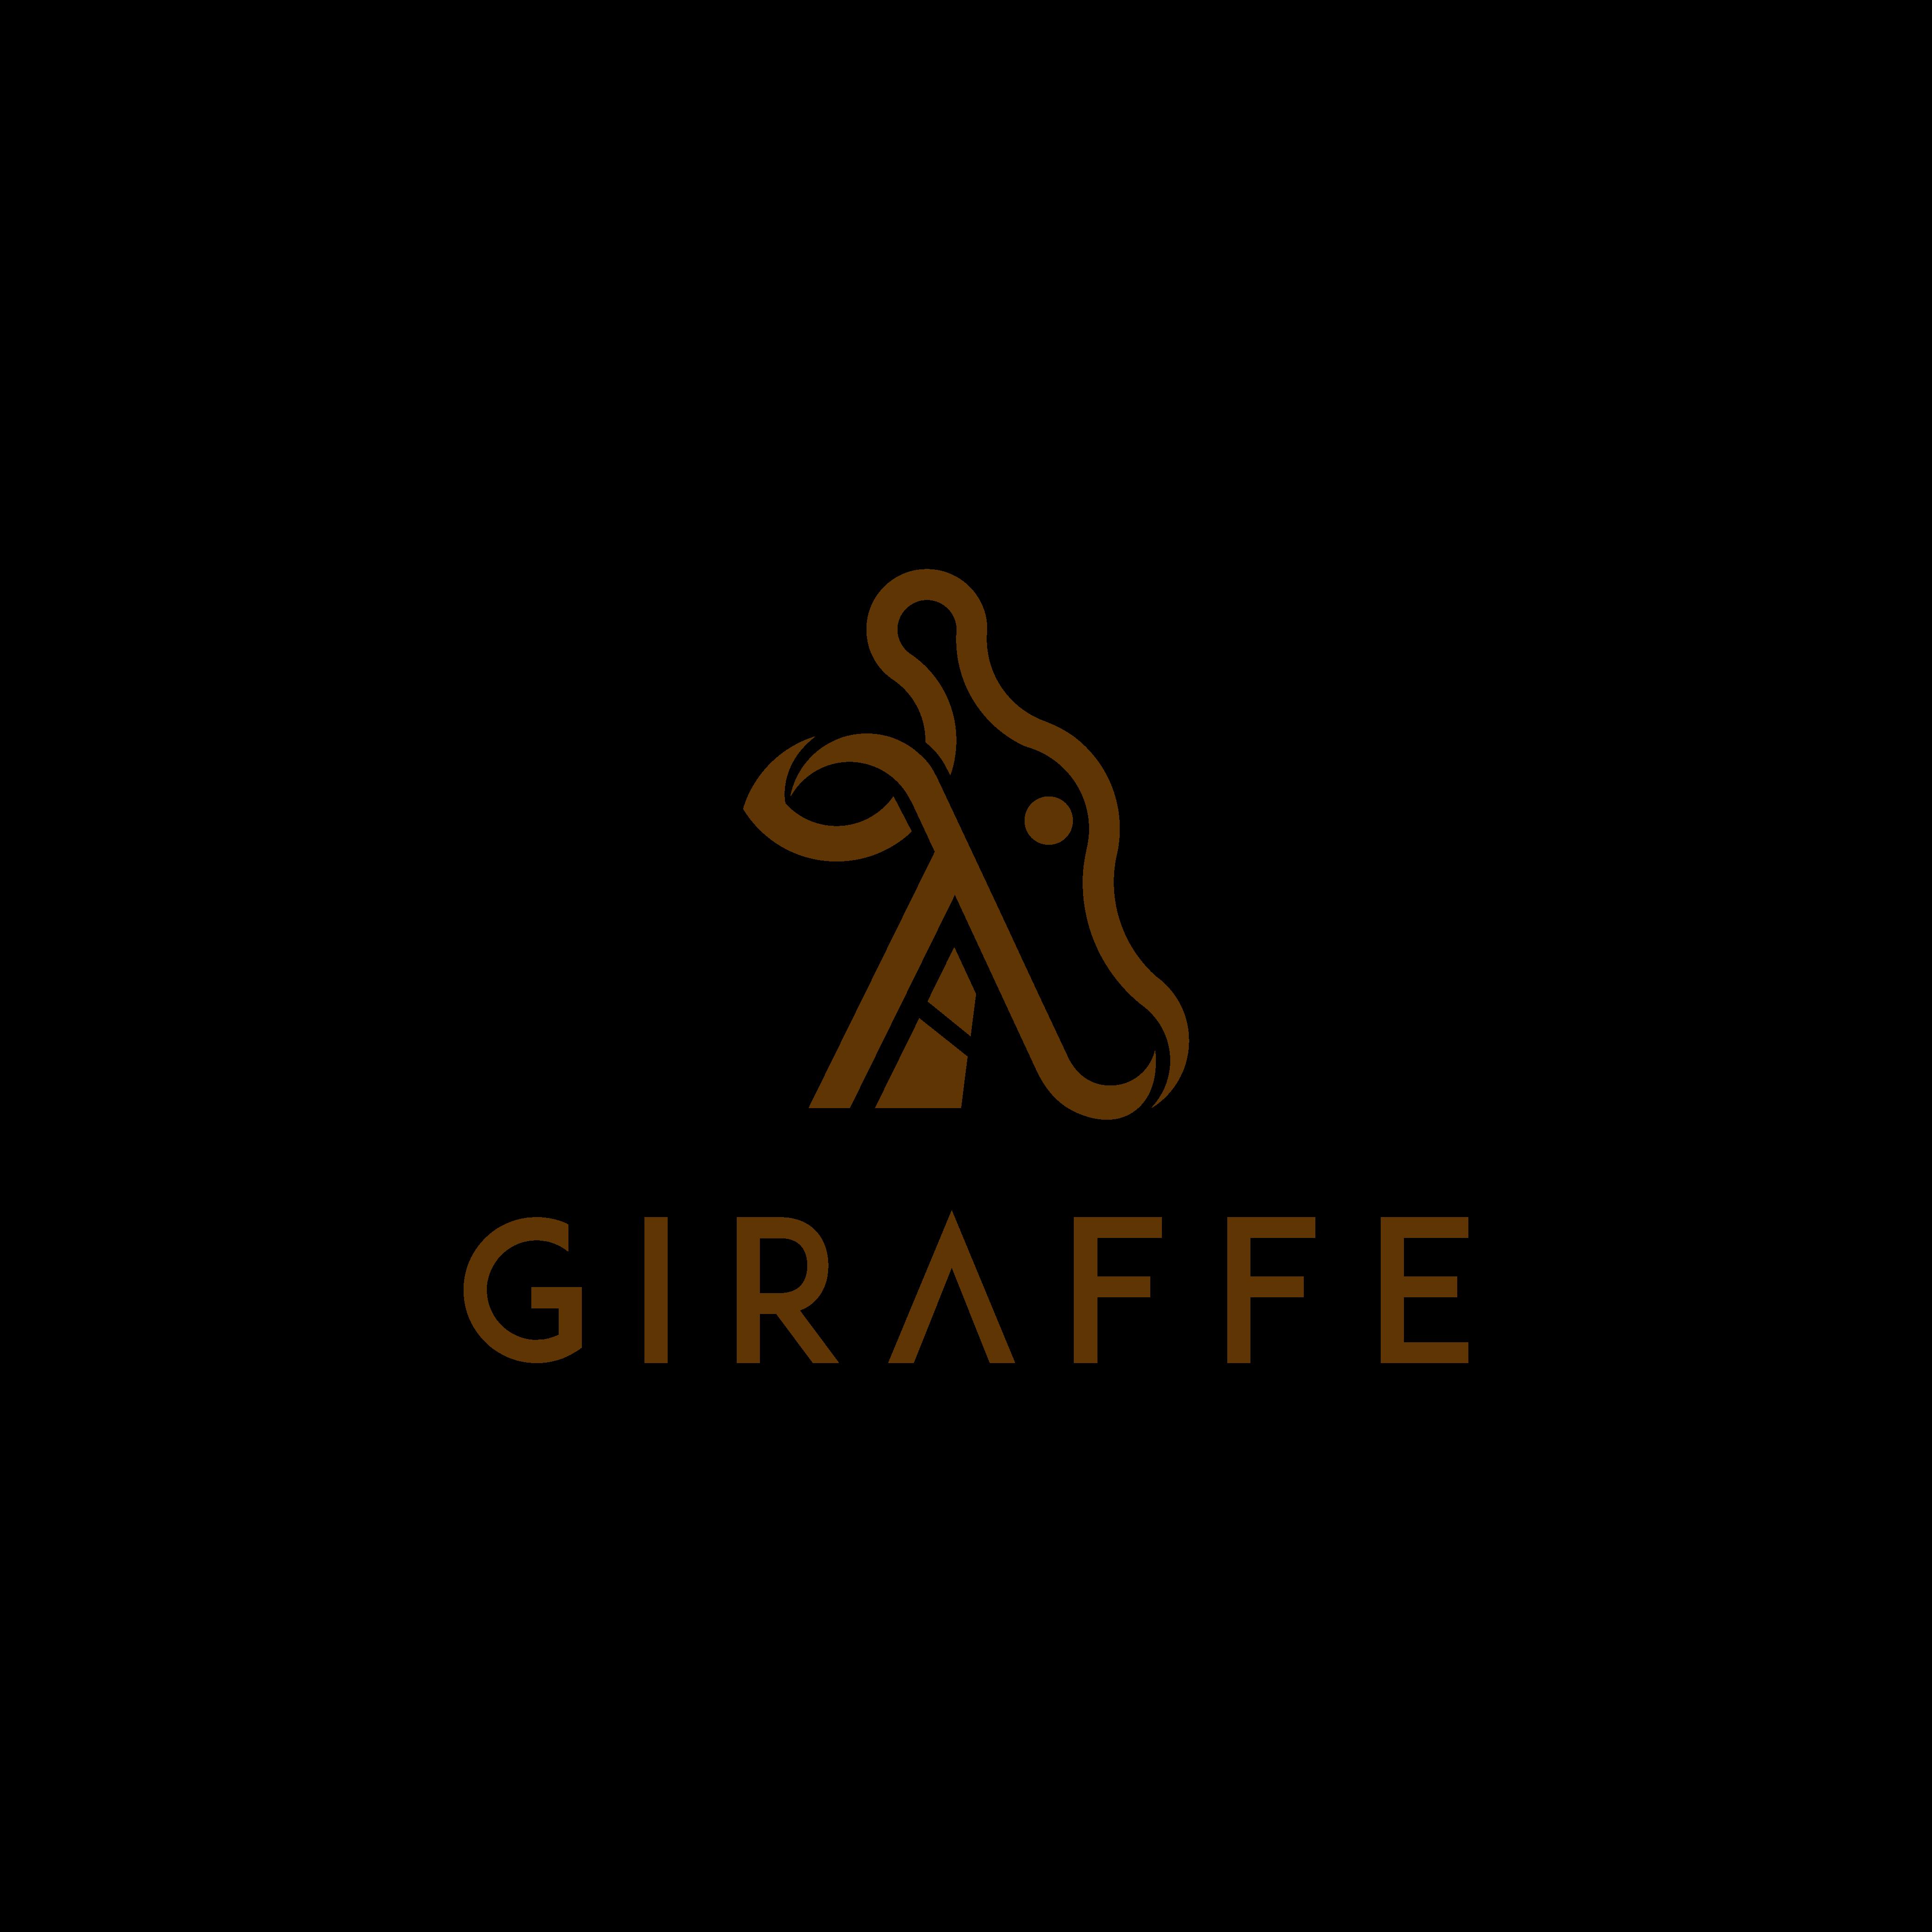 Design a giraffe logo in the form of the lambda calculus sign